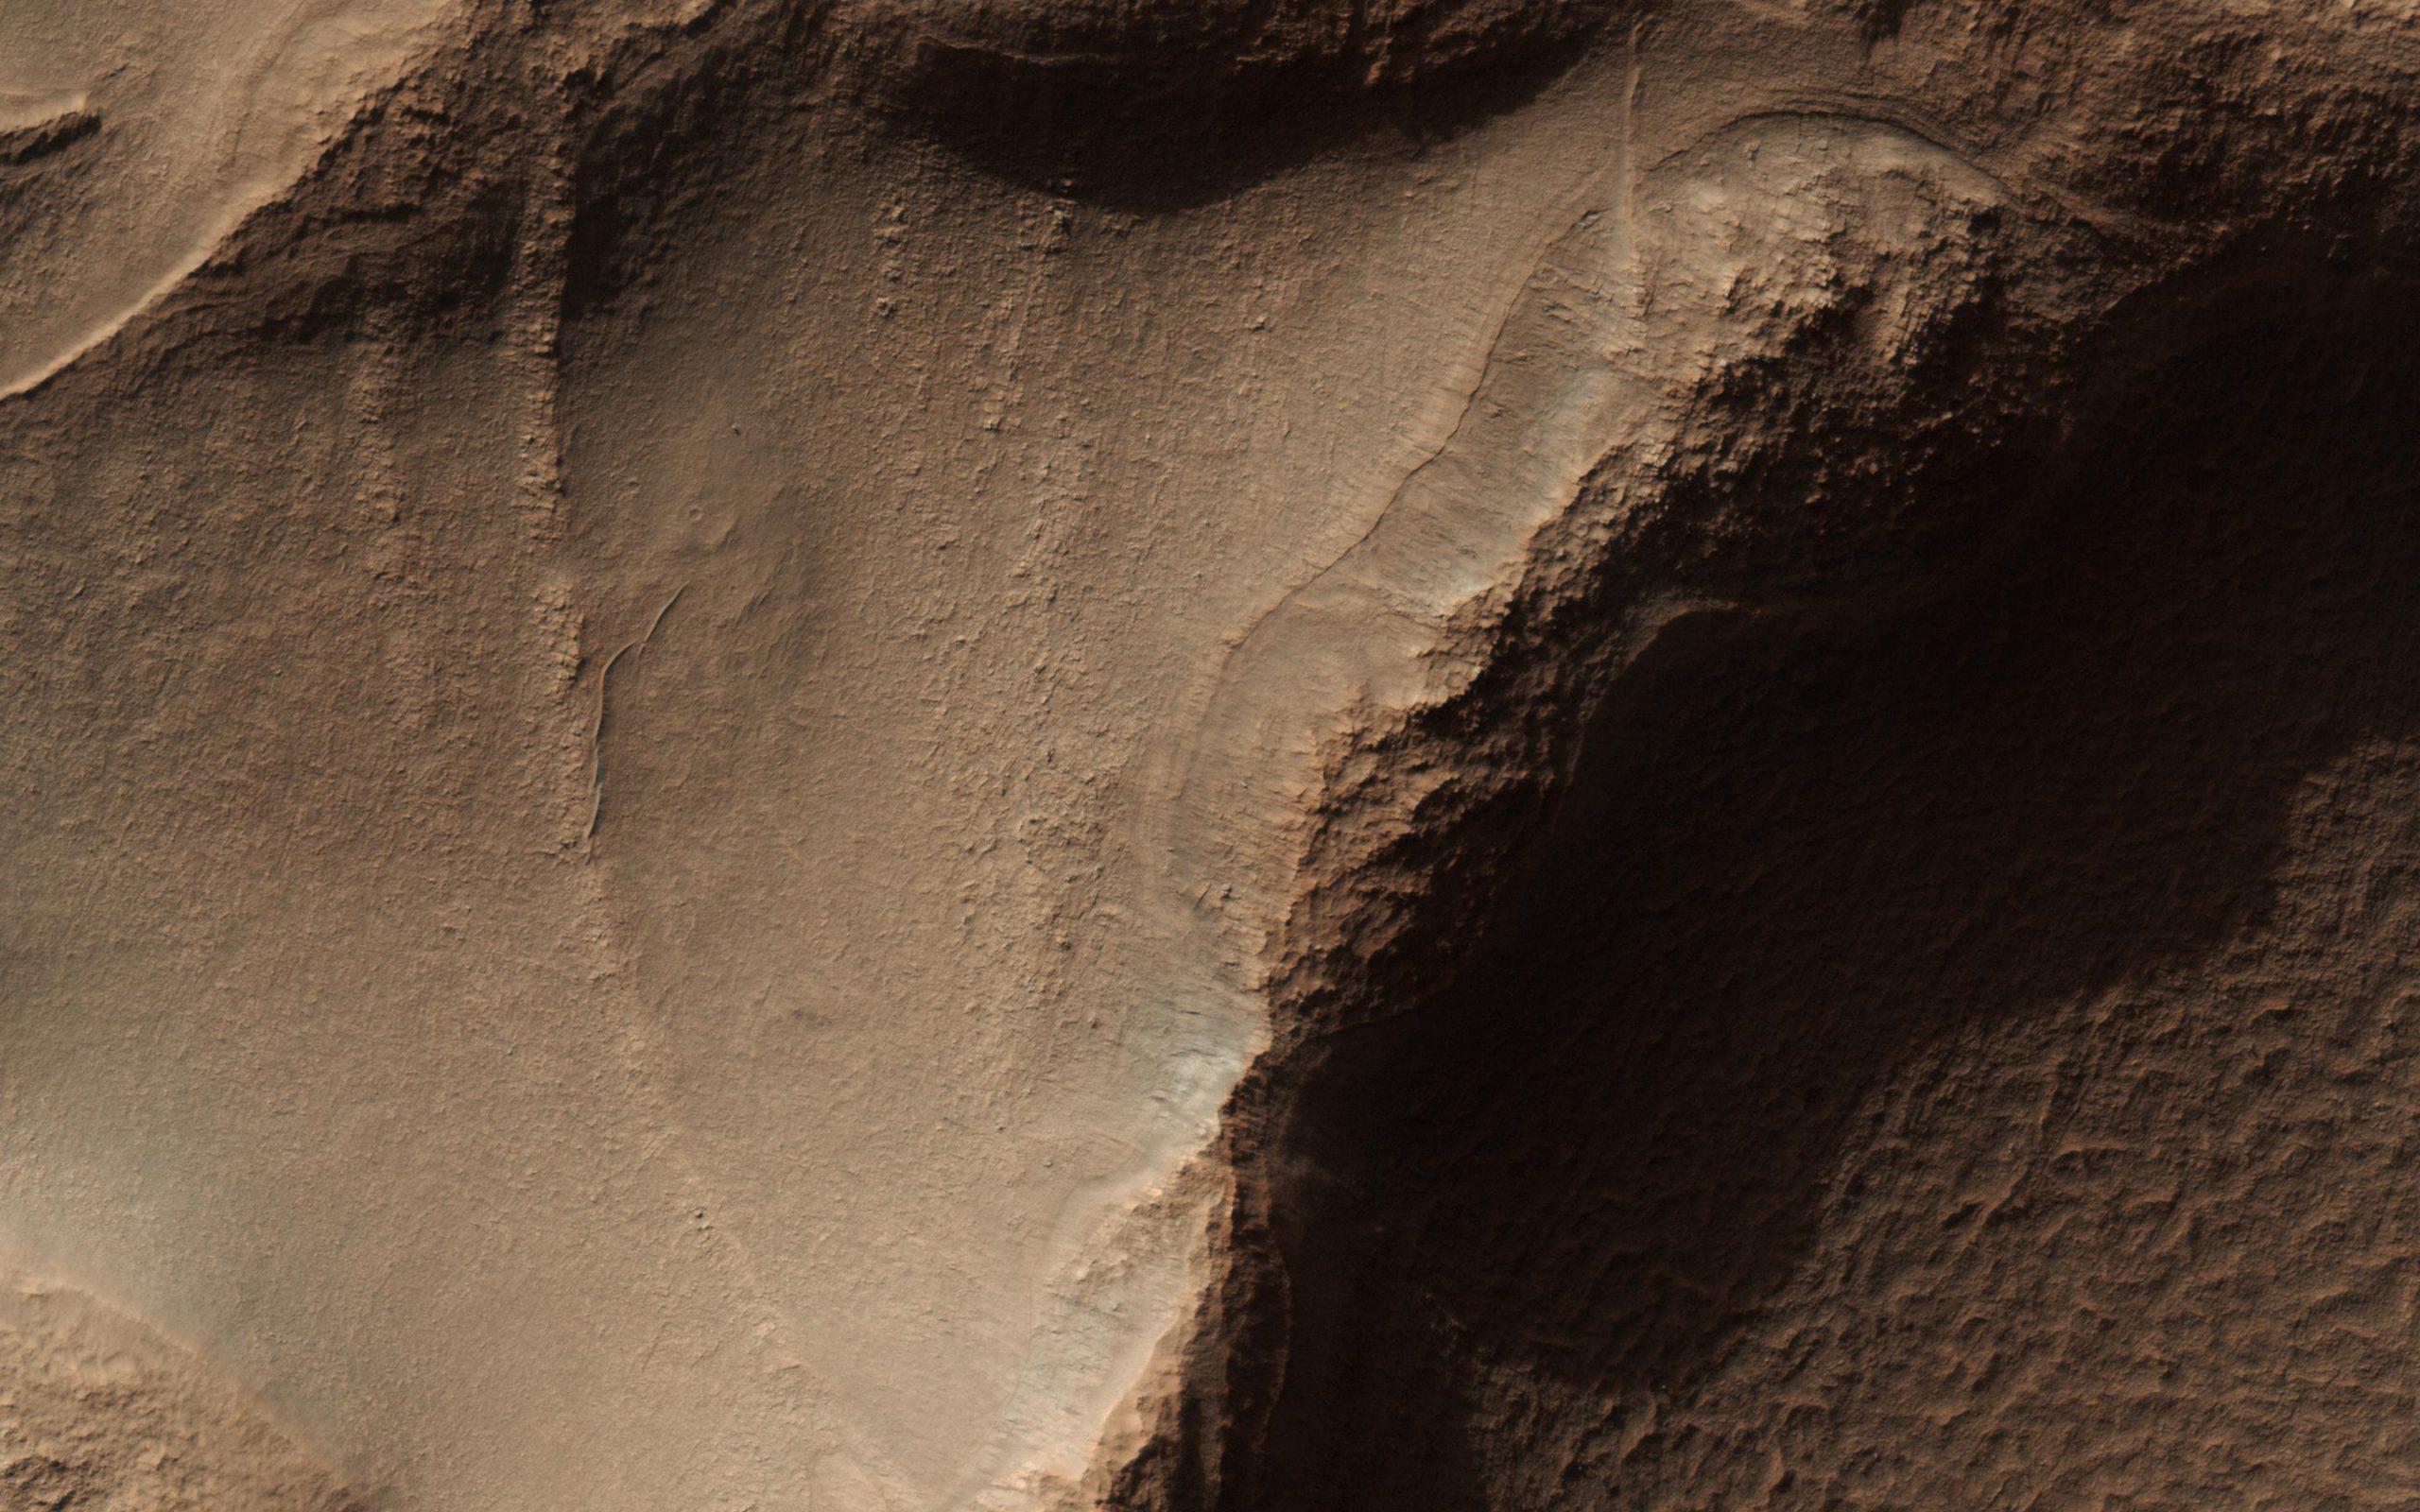 Porzione di terra di Hellas Planitia